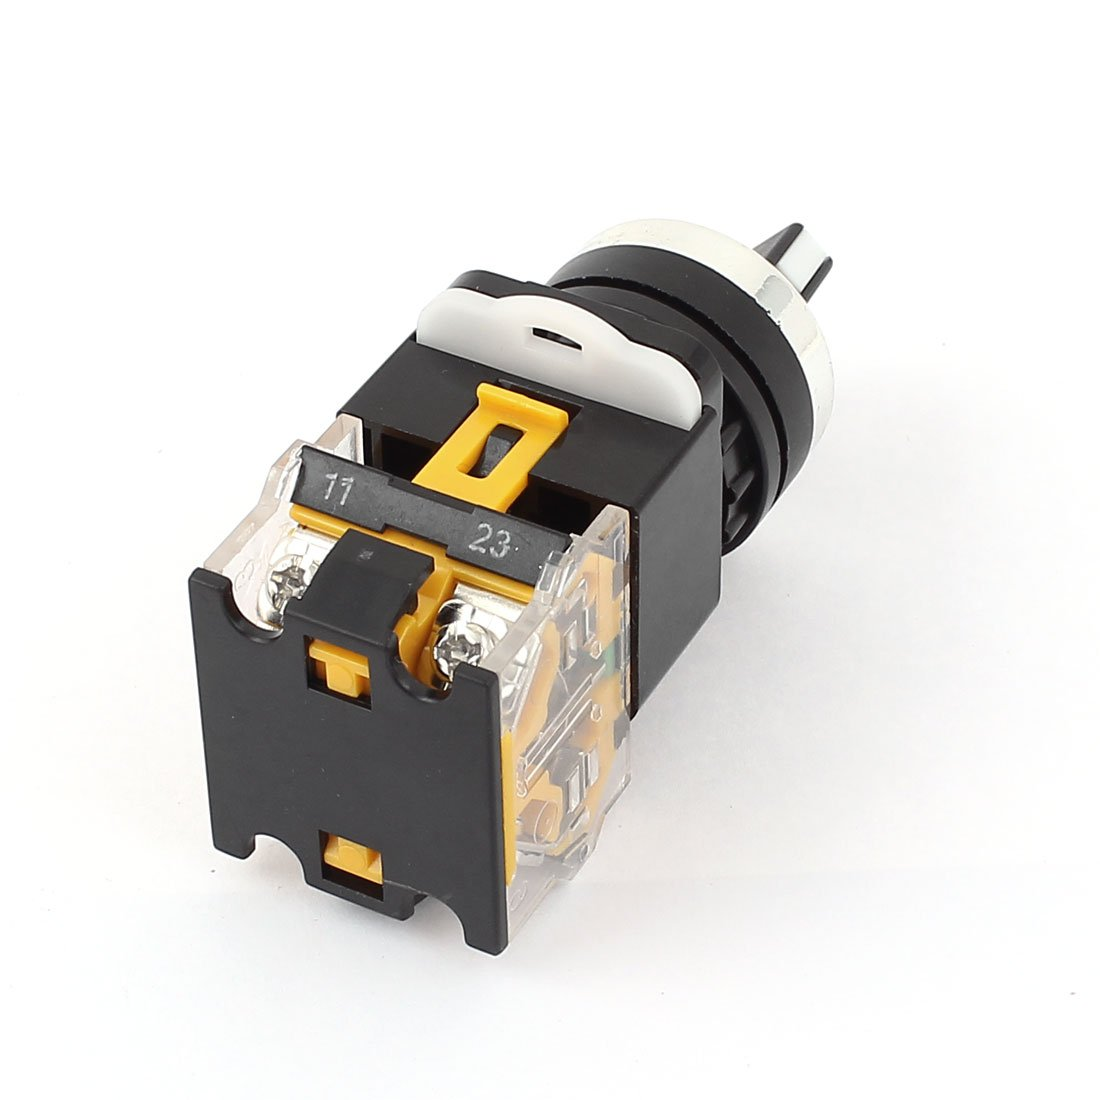 SOURCING MAP sourcingmap AC 380V 10A 2 posiciones DPST enclavamiento Selector selector giratorio 5 PC Bloqueo